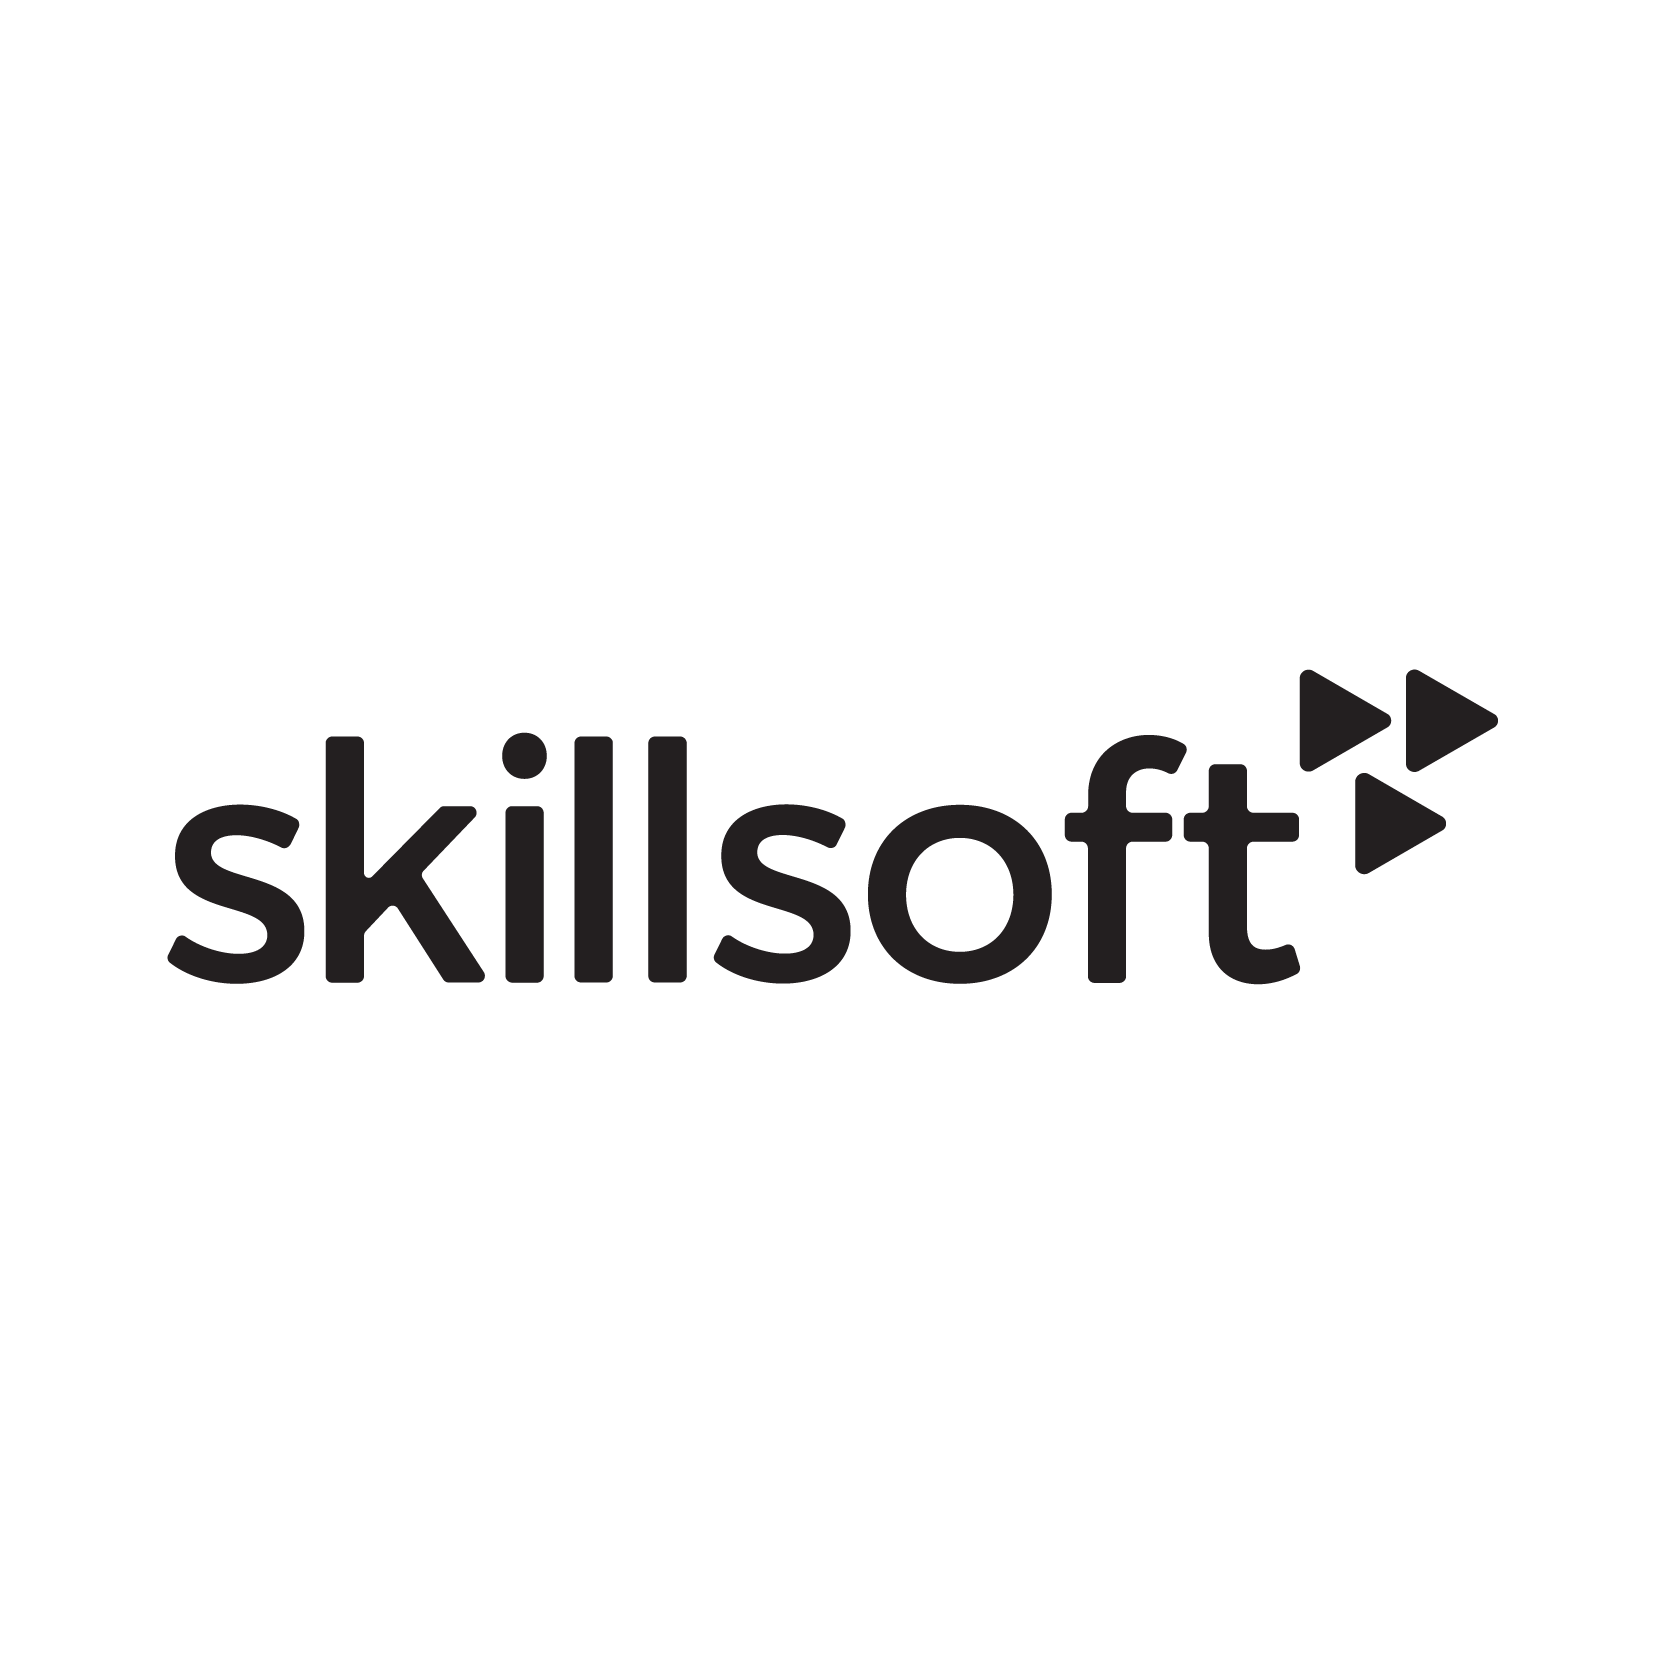 Skillsoft client logo